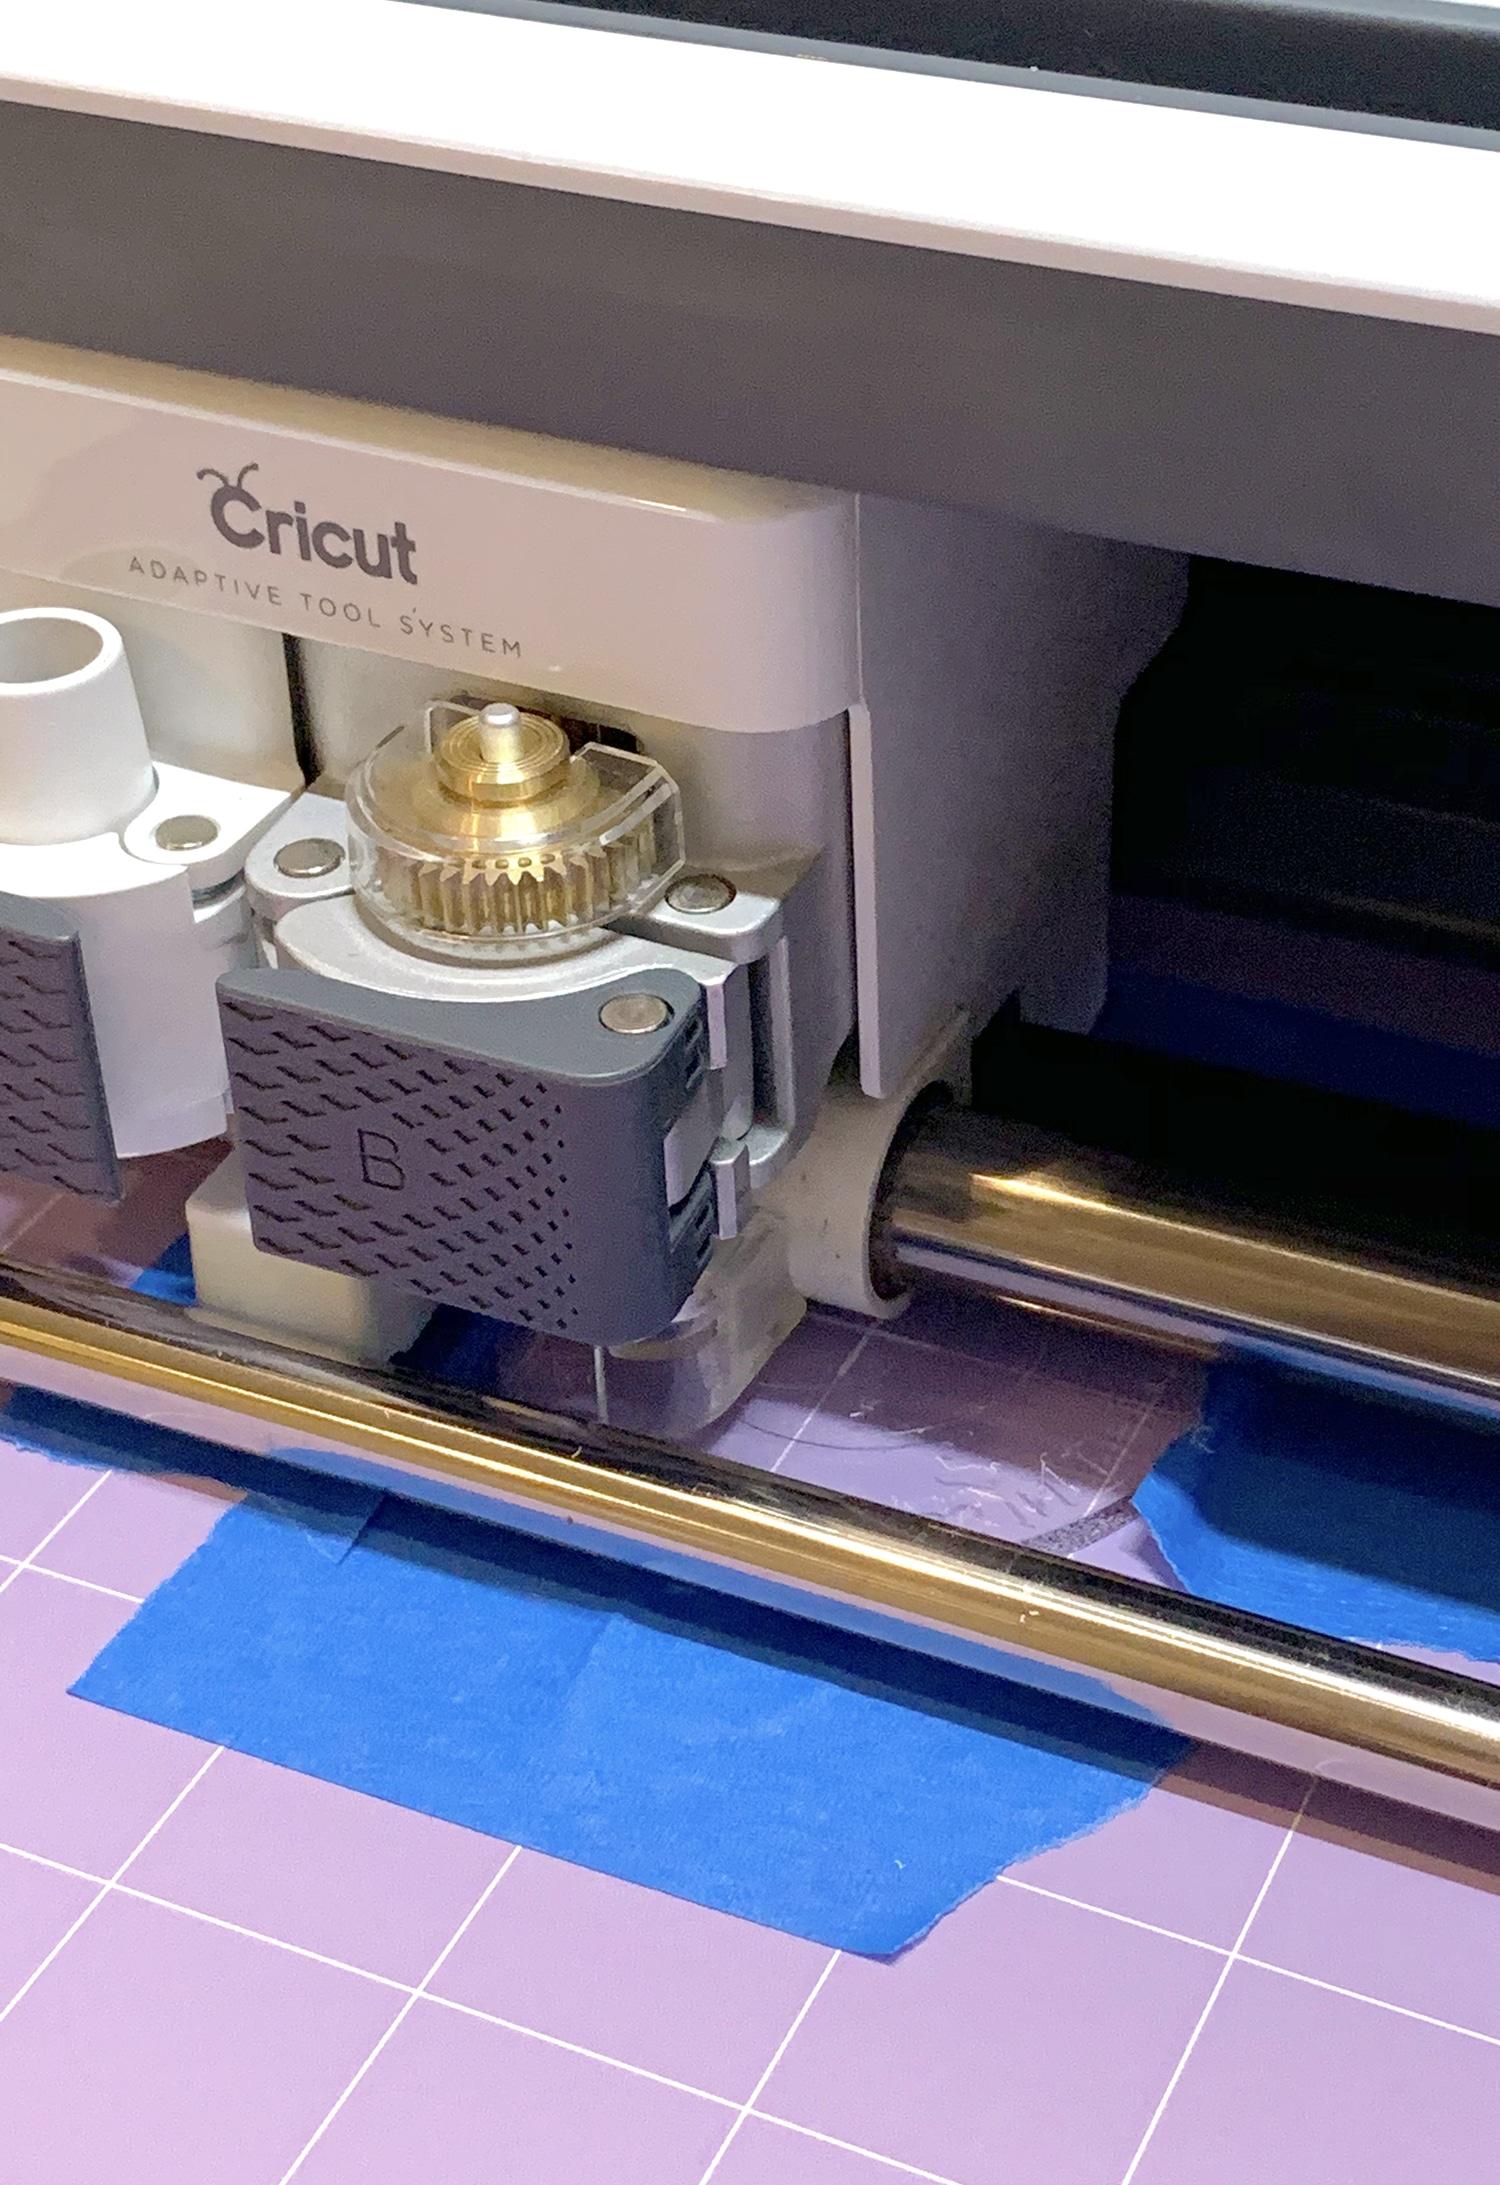 Cricut Maker machine engraving an acrylic disc with the Cricut Engraving Tool Tip